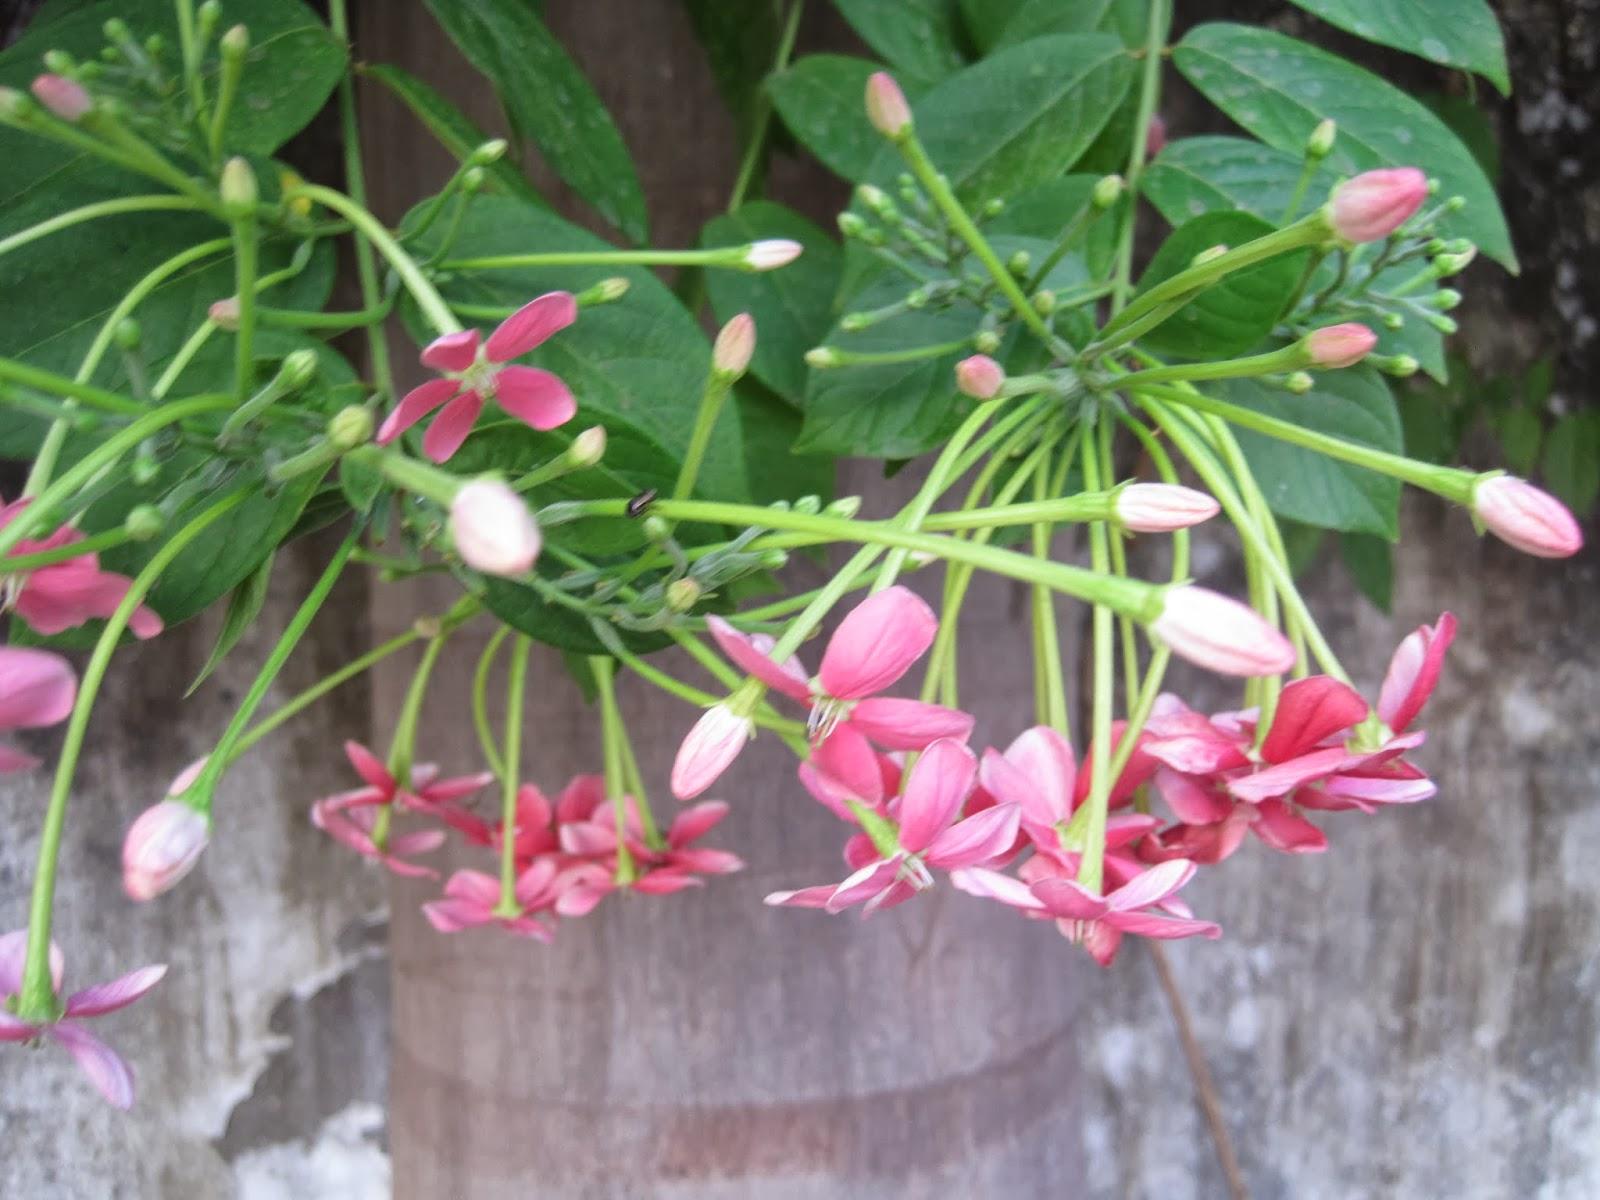 Pink Cassia Flower Madhu Malti Flower Random Photography